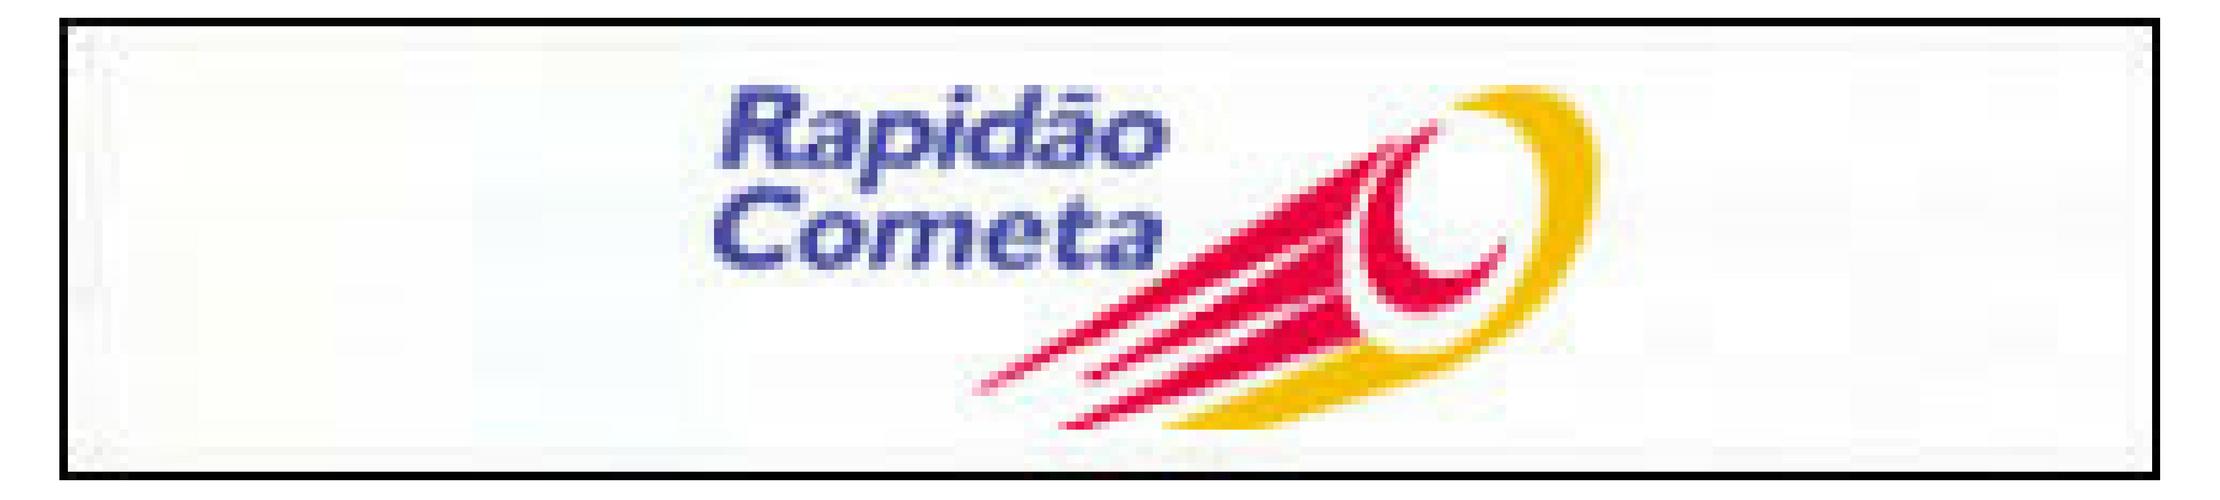 FEDEX-BRASIL-LOGISTICA-E-TRANSPORTES-LTDA-logo.png